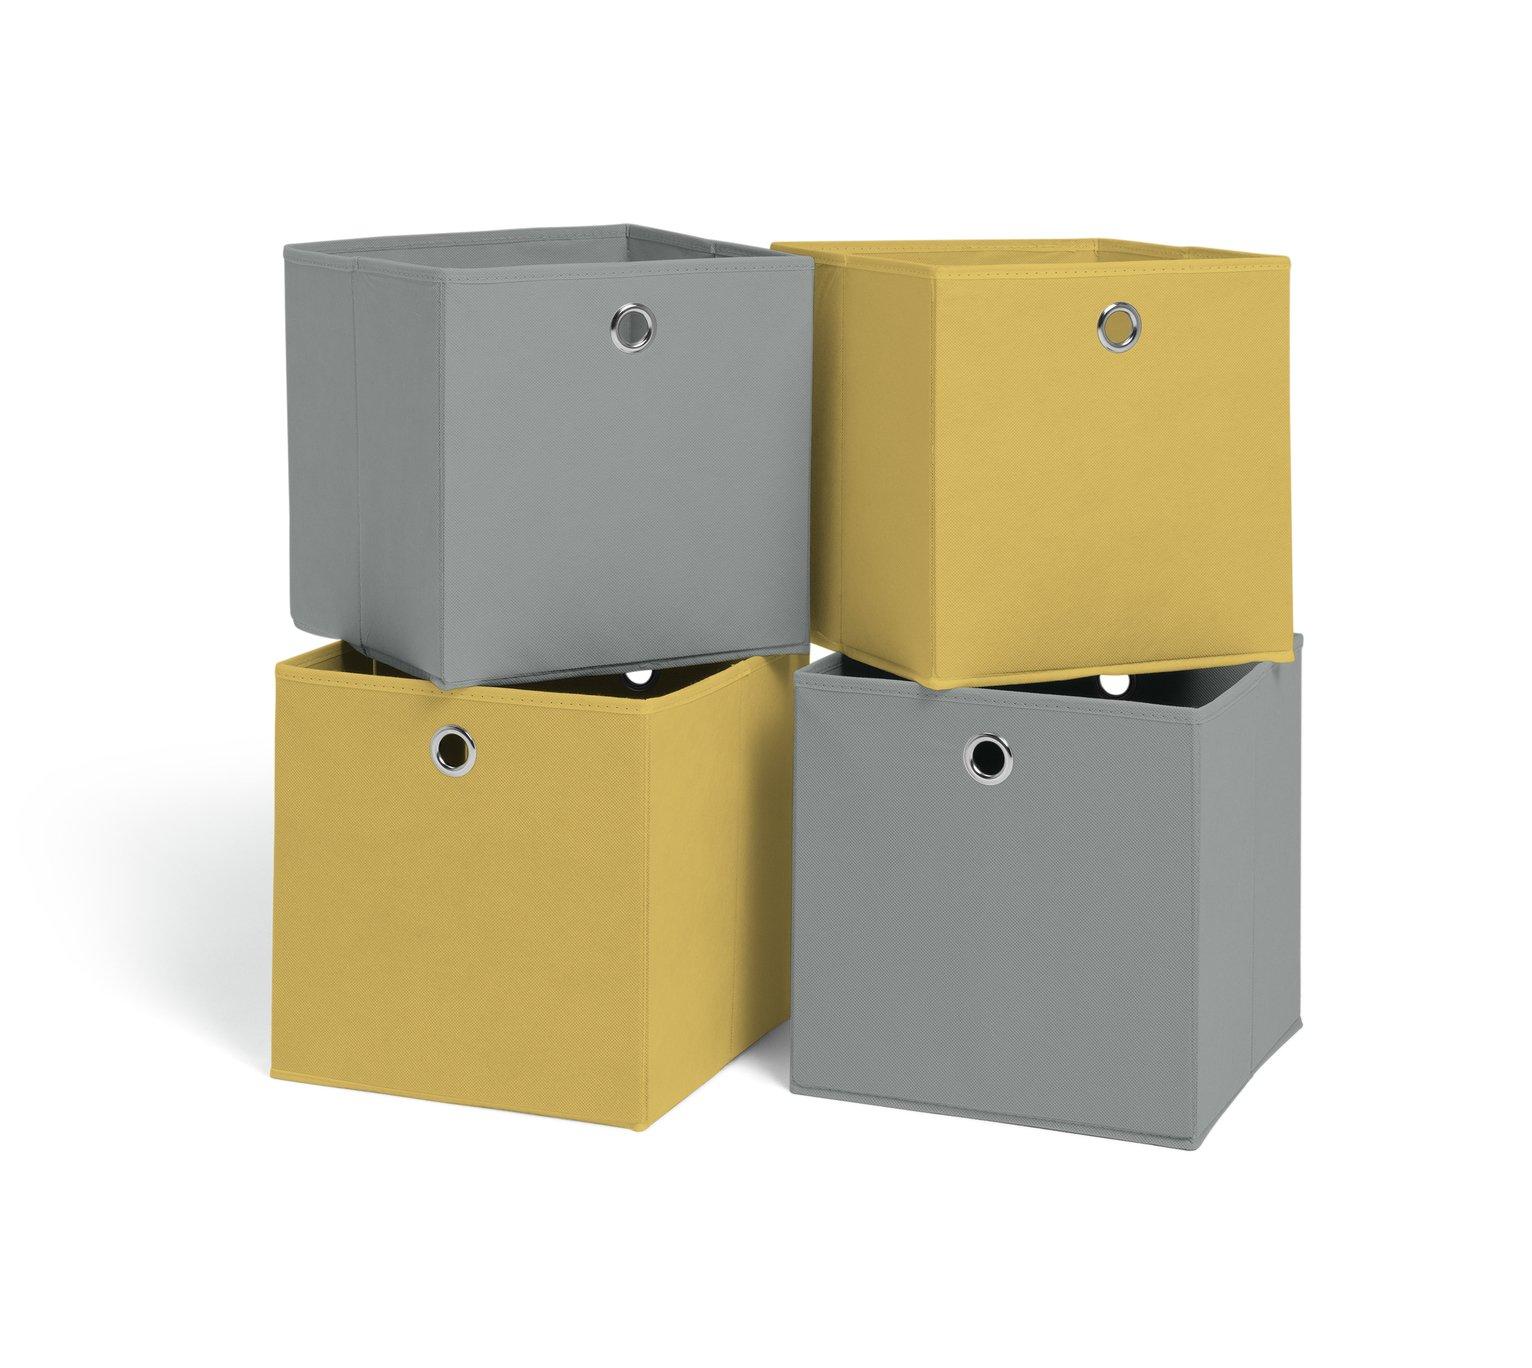 Habitat Set of 4 Squares Plus Boxes - Soft Grey & Yellow